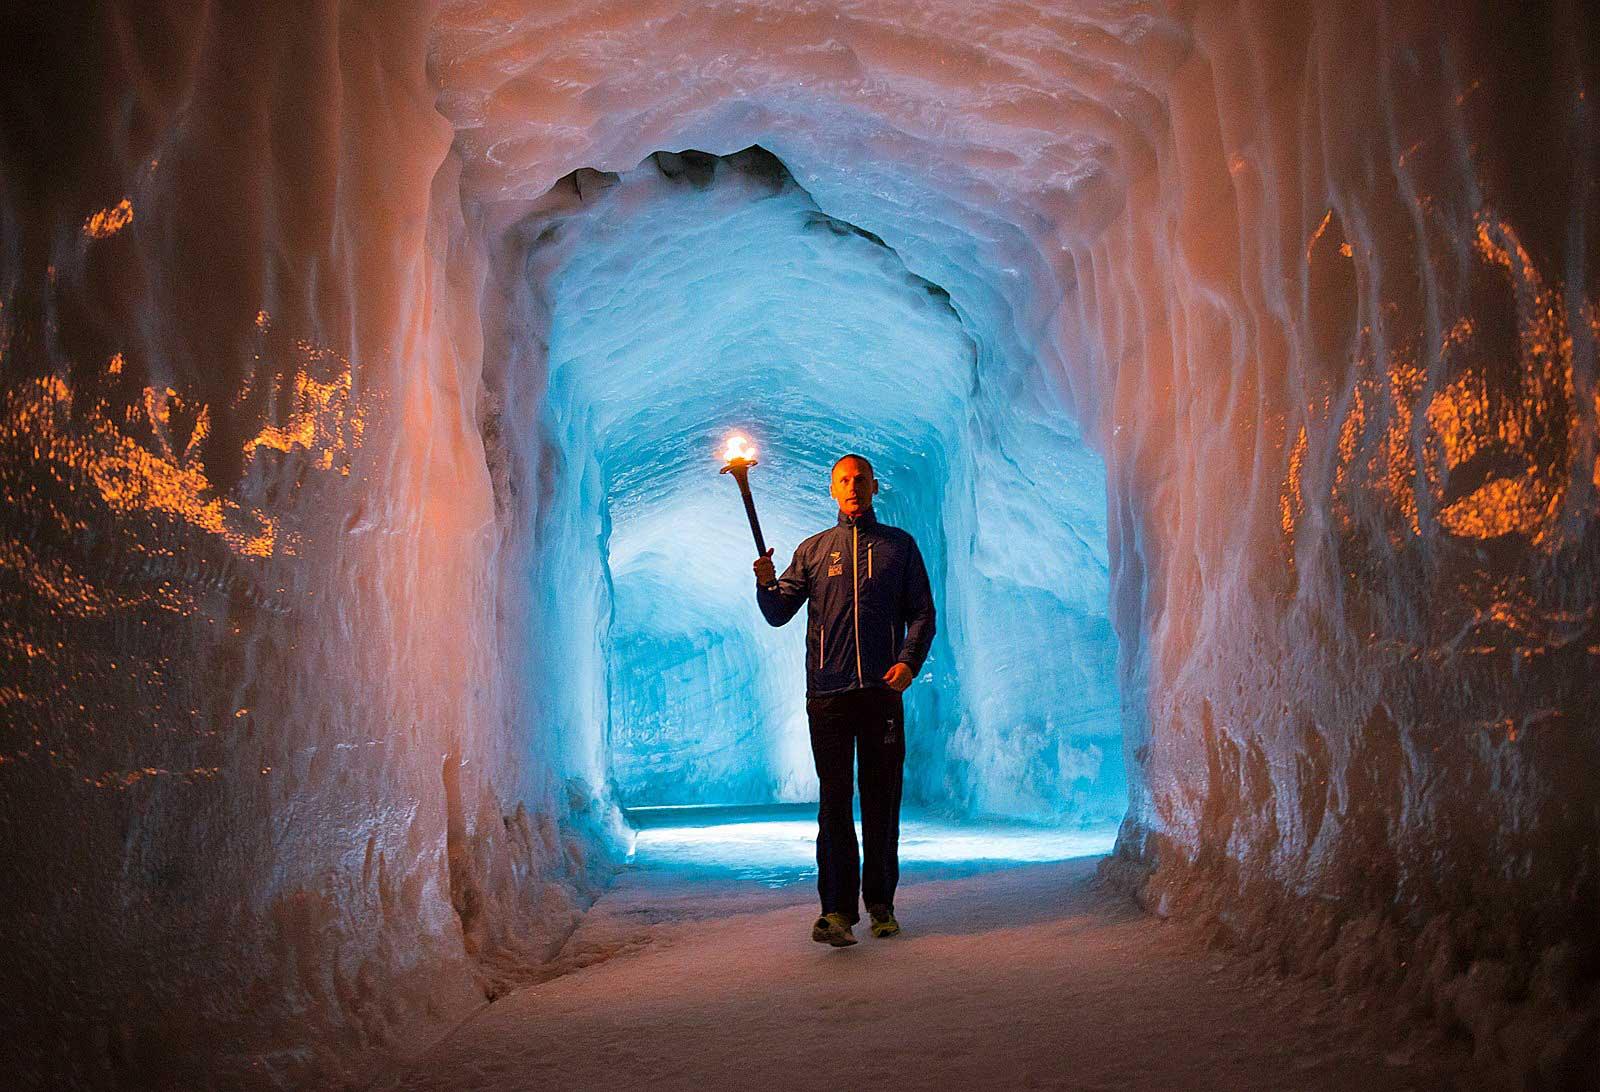 glacier-peace-run-iceland-1